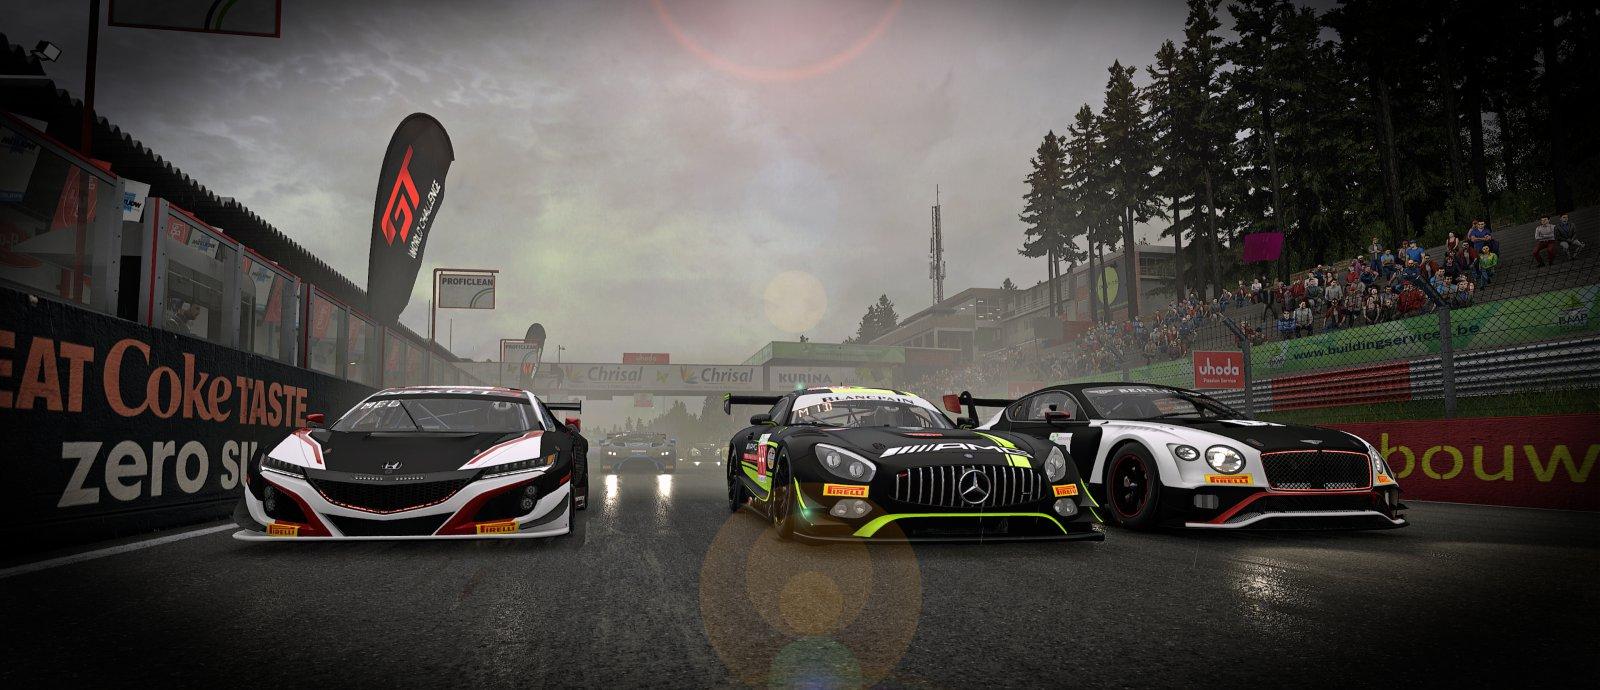 Assetto Corsa Competizione Screenshot 2020.02.12 - 02.53.09.60.jpg